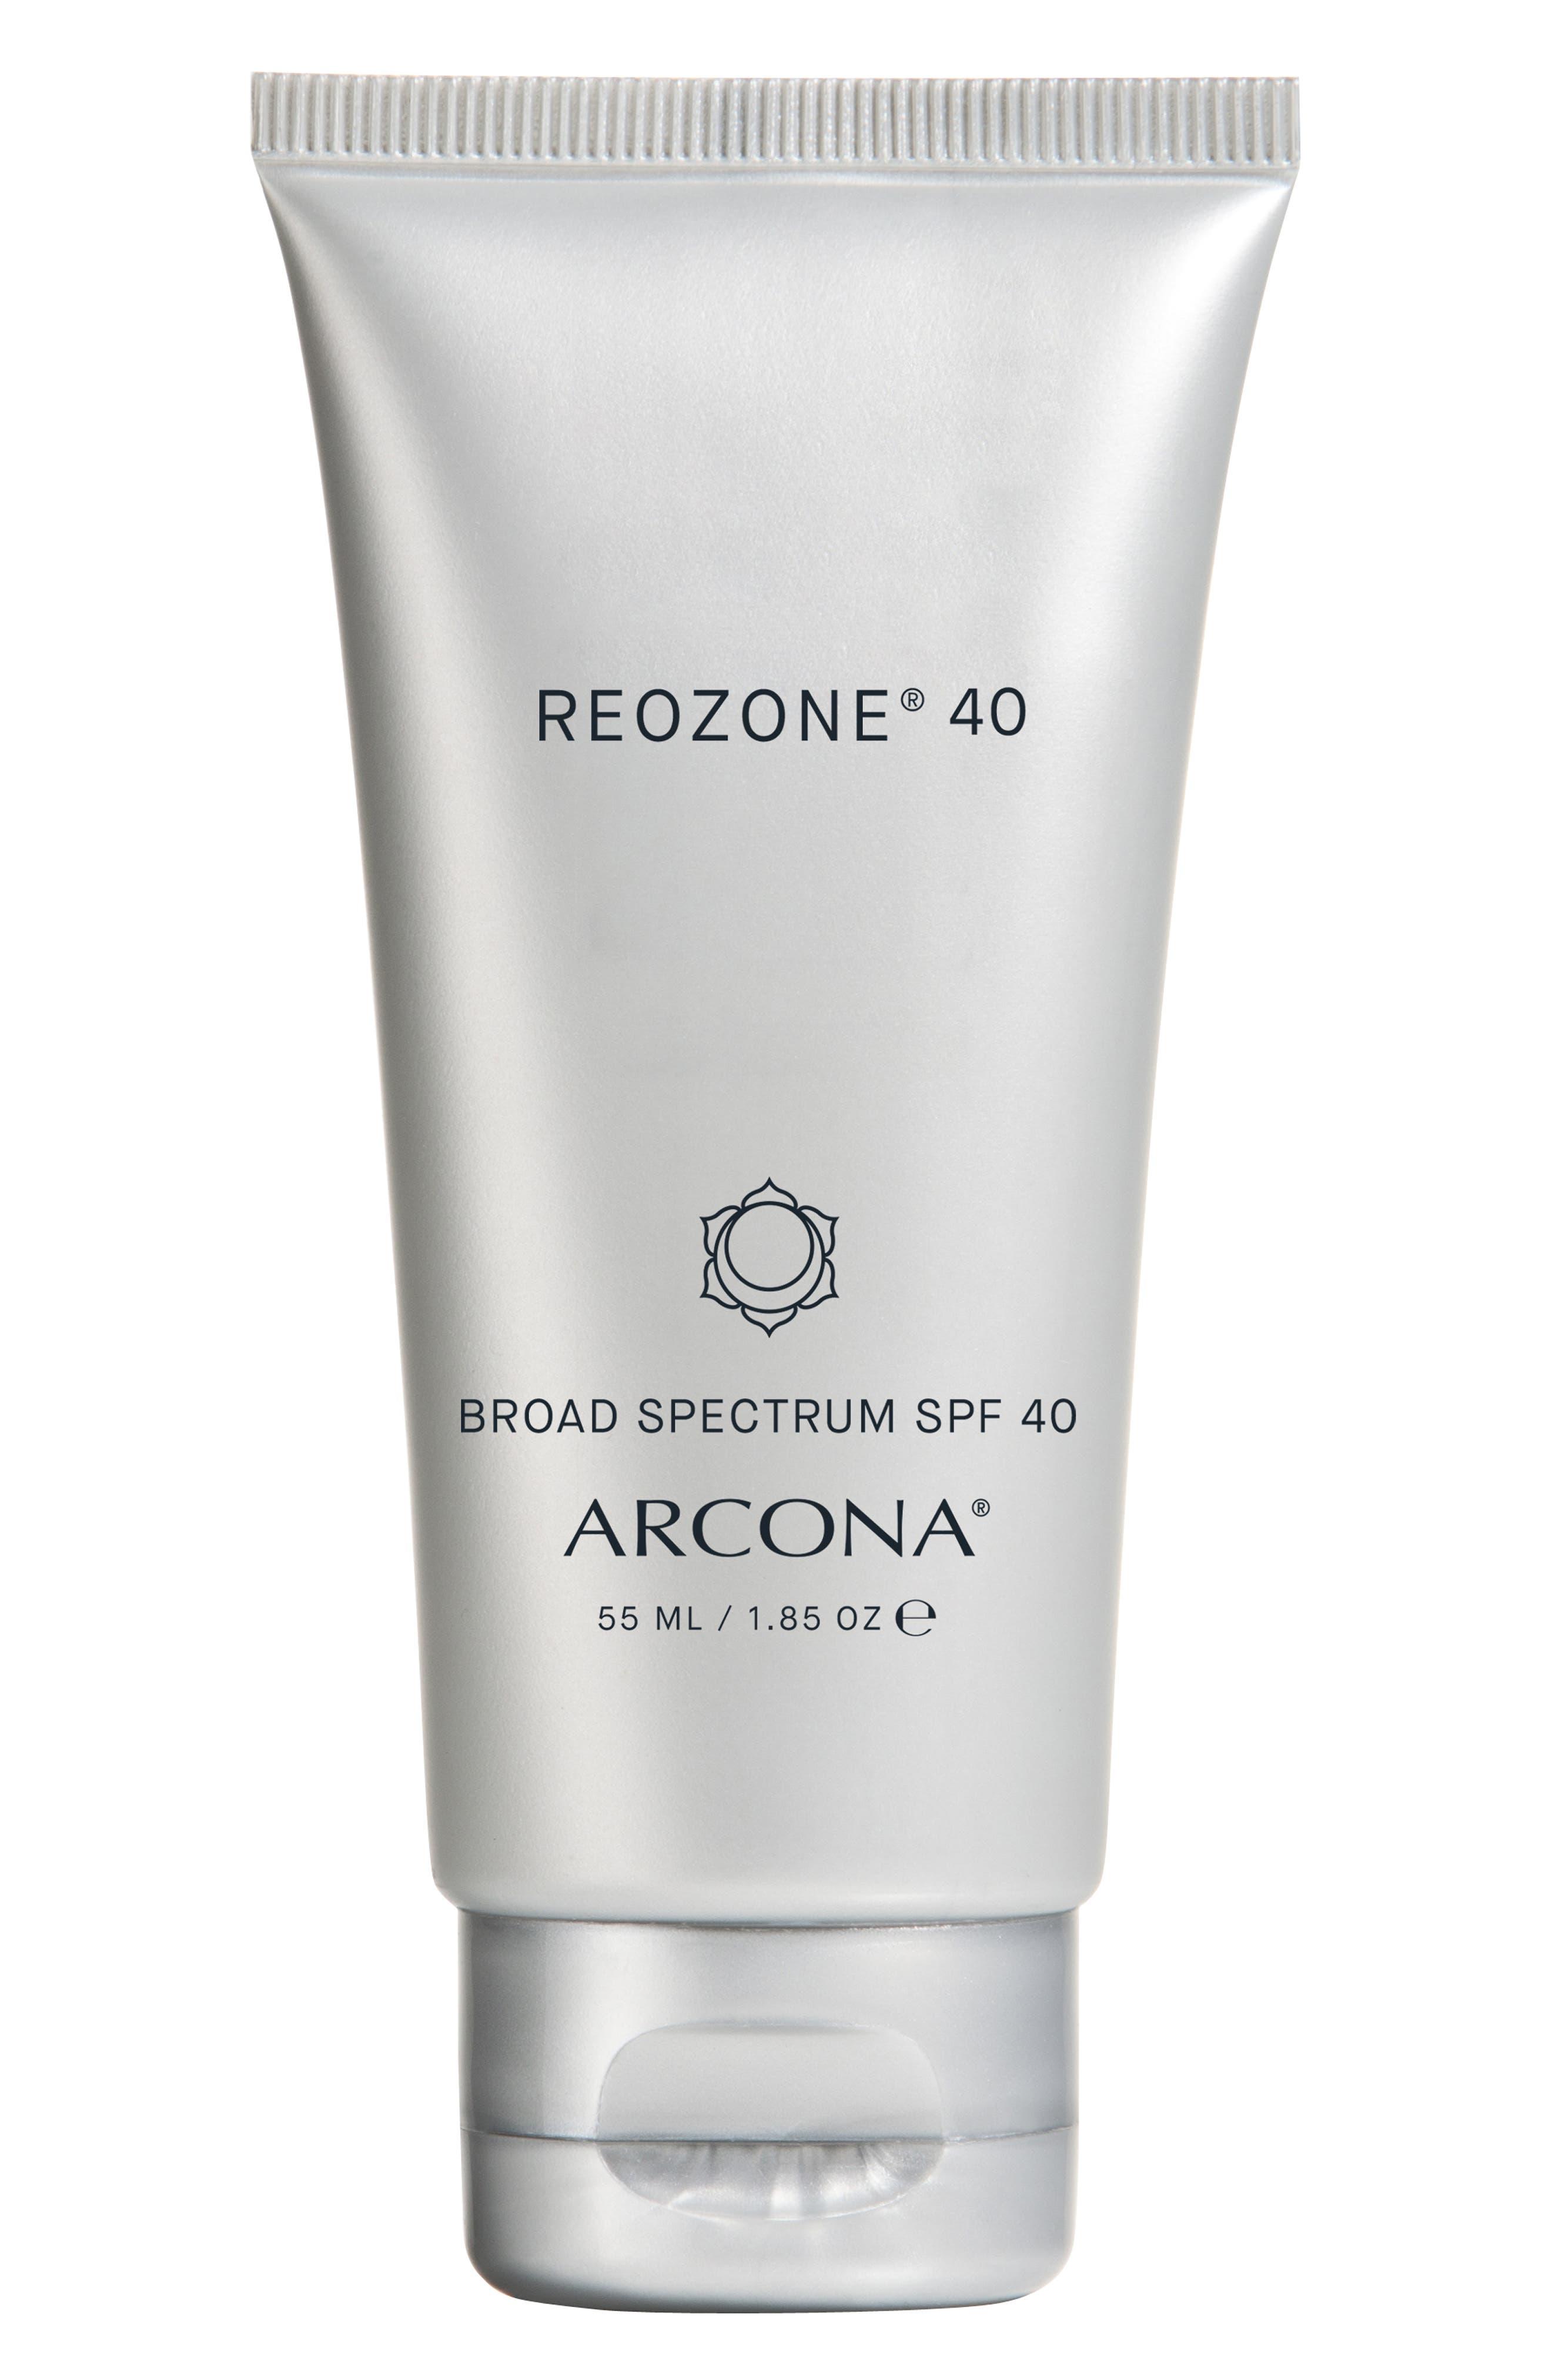 Reozone 40 Broad Spectrum Spf 40 Sunscreen